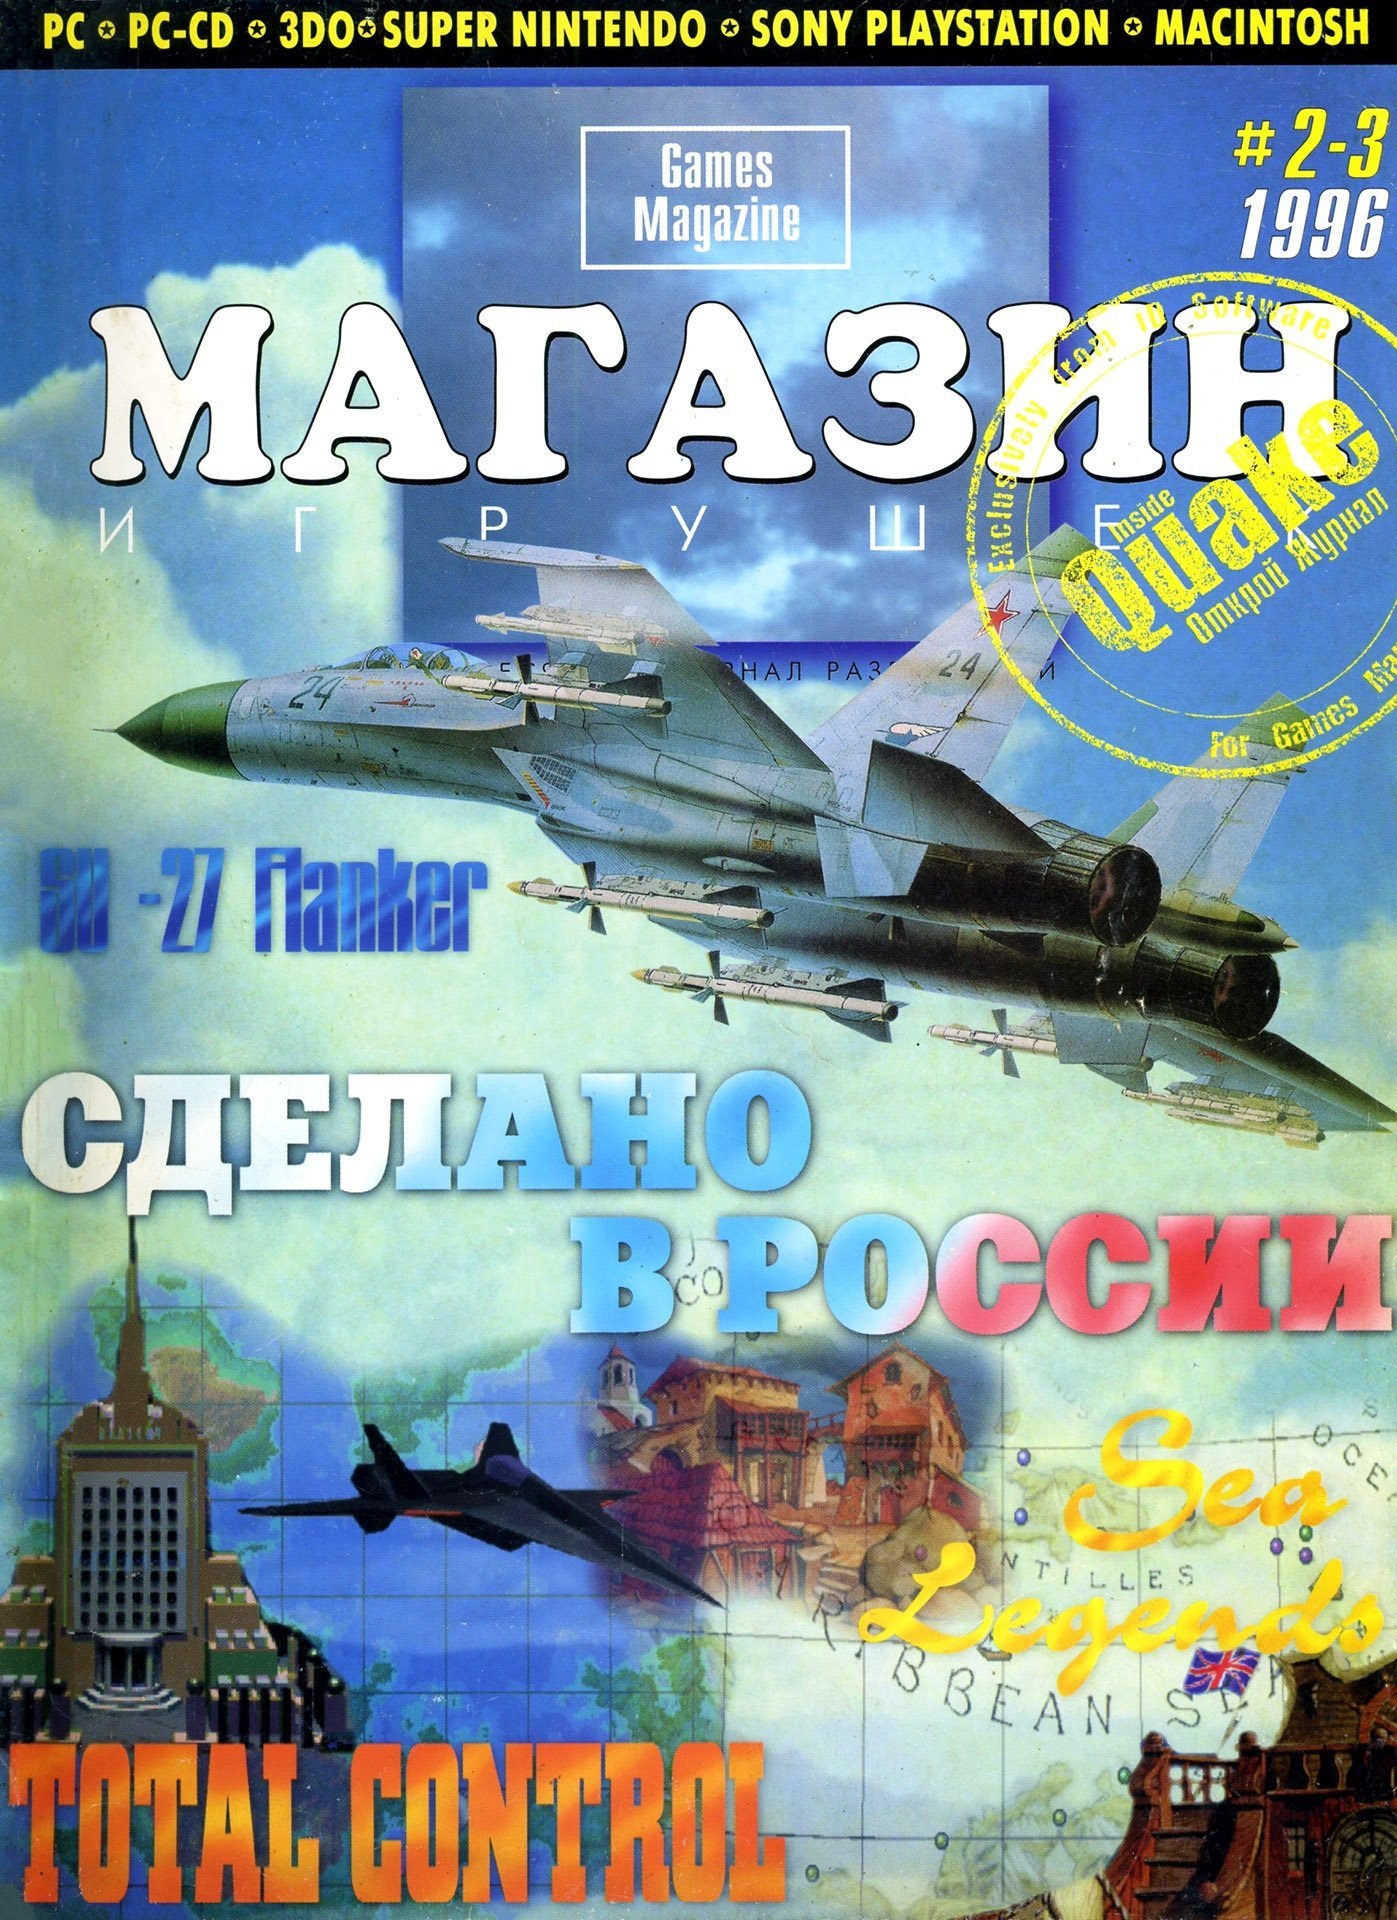 Games Magazine (Магазин Игрушек) Issue 07-08 (February-March 1996)